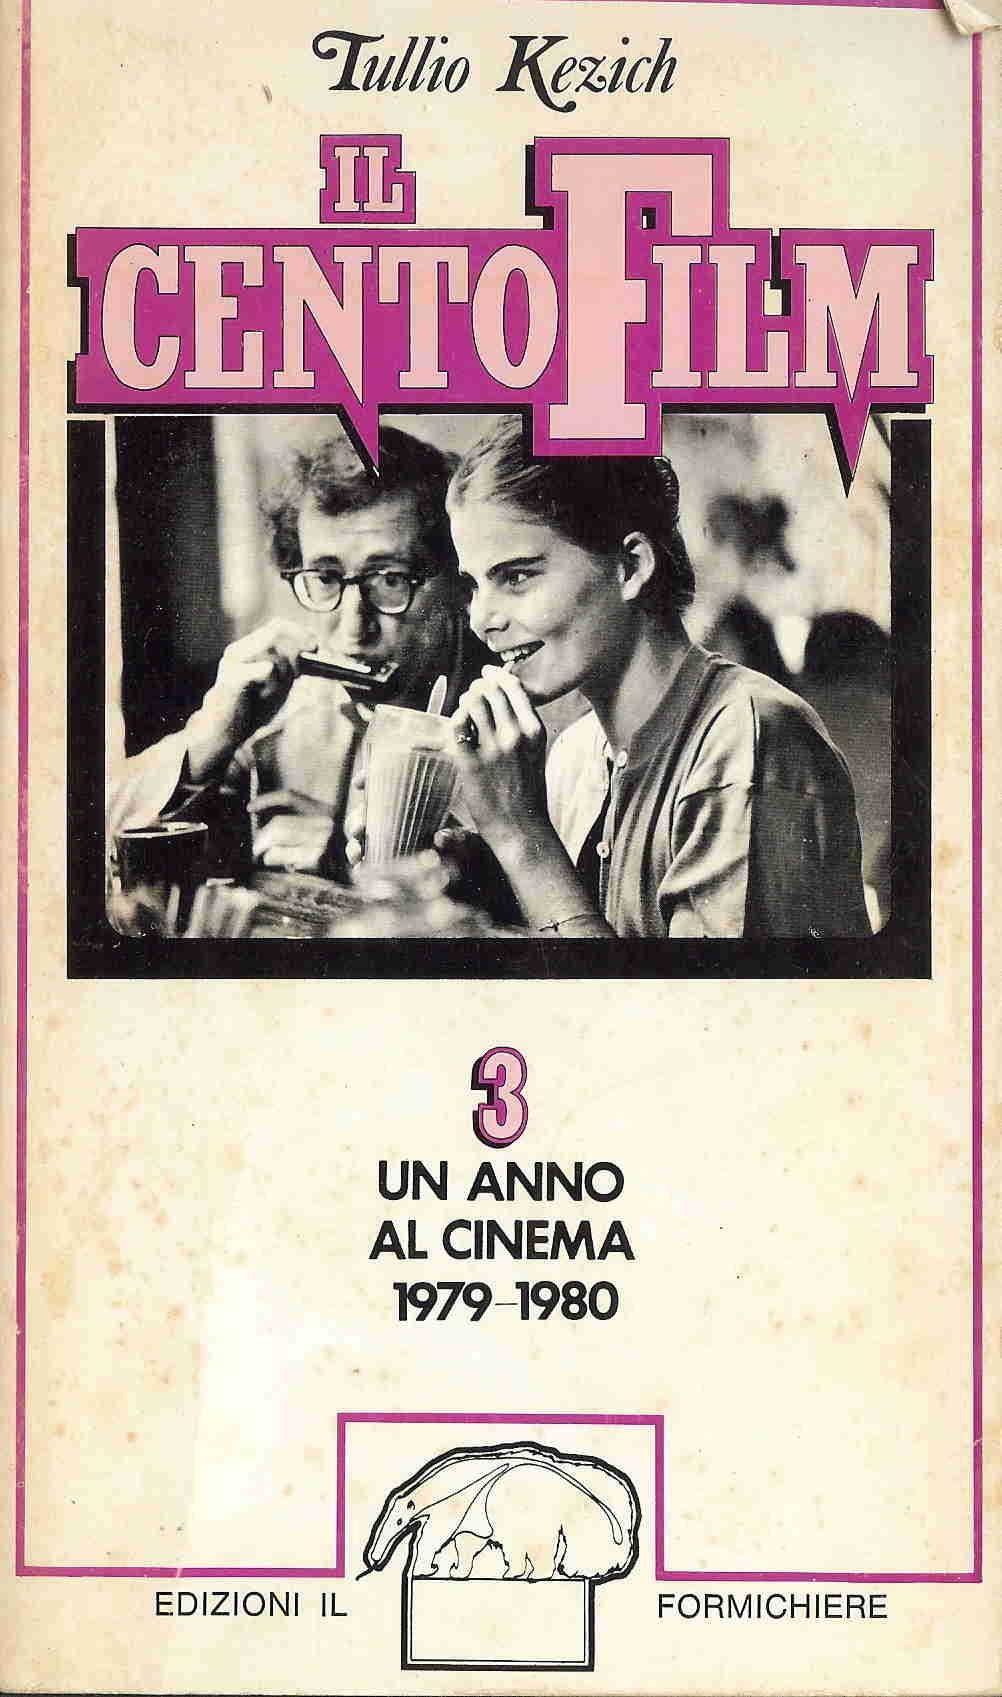 Il centofilm 1979-1980